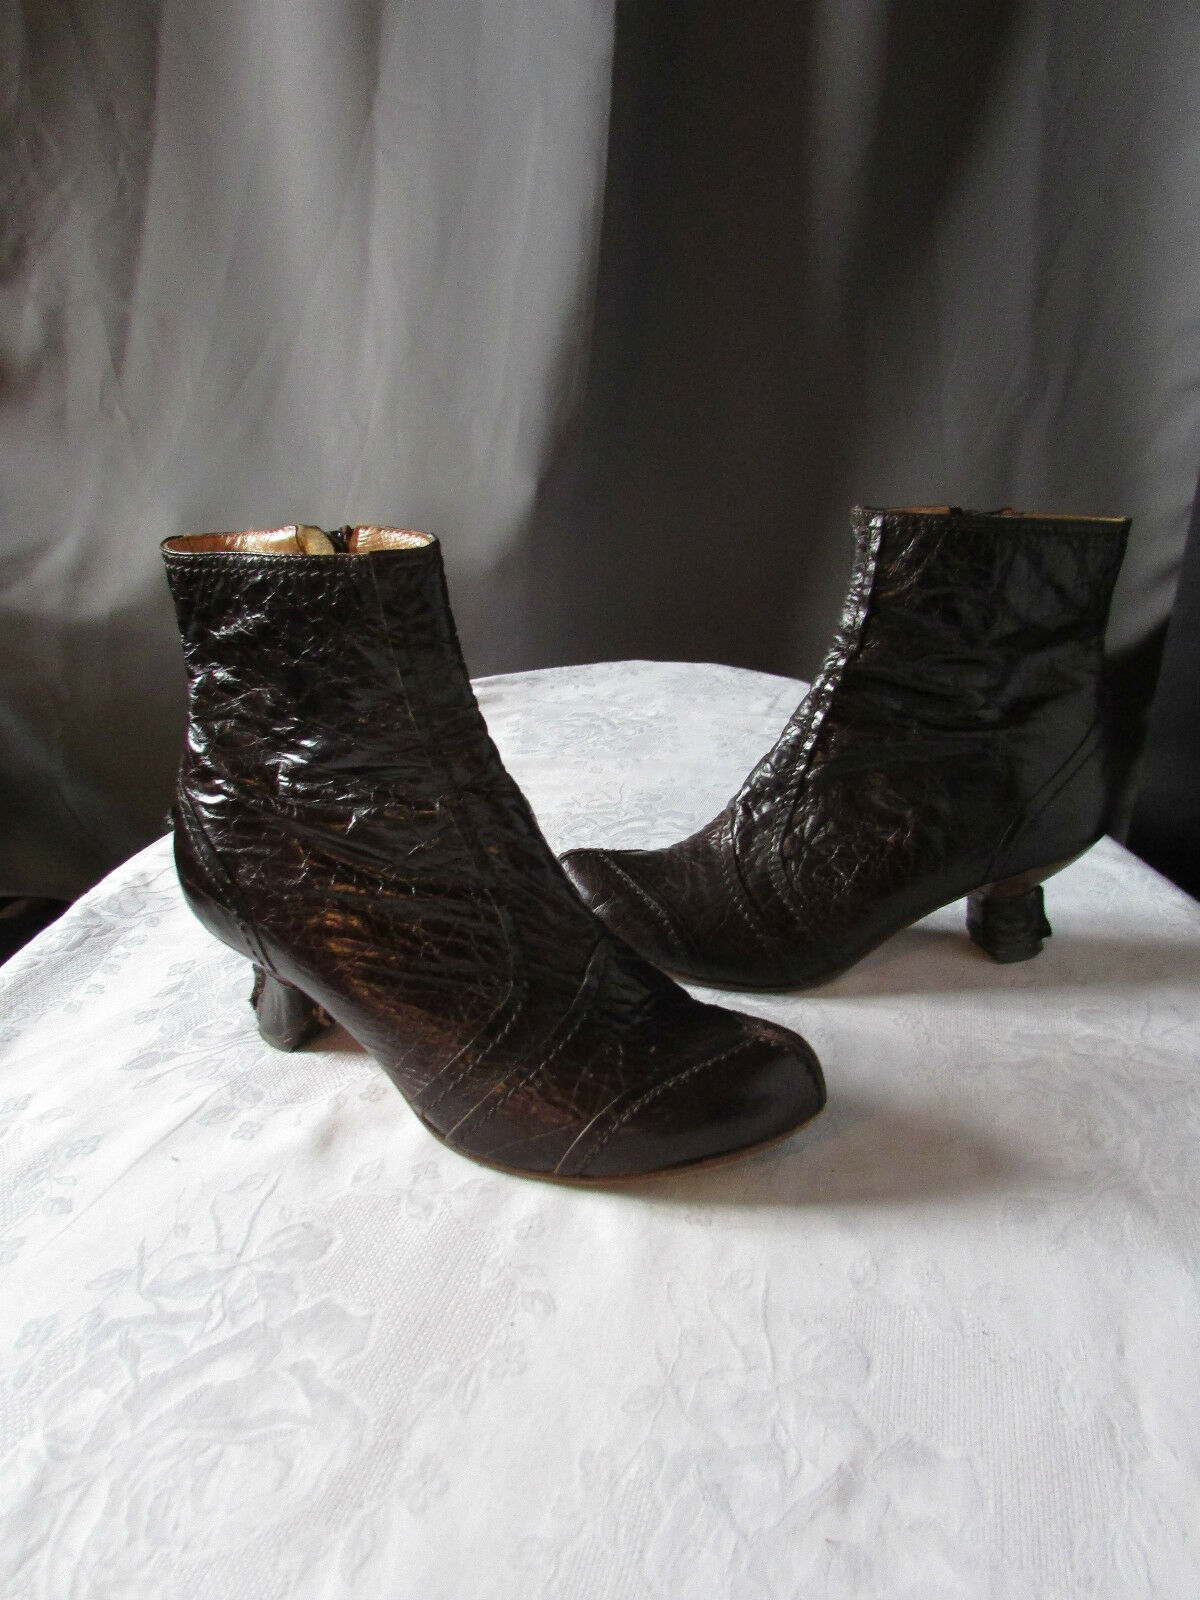 Stiefel/bottines harlot cuir marron chocolat pointure 37